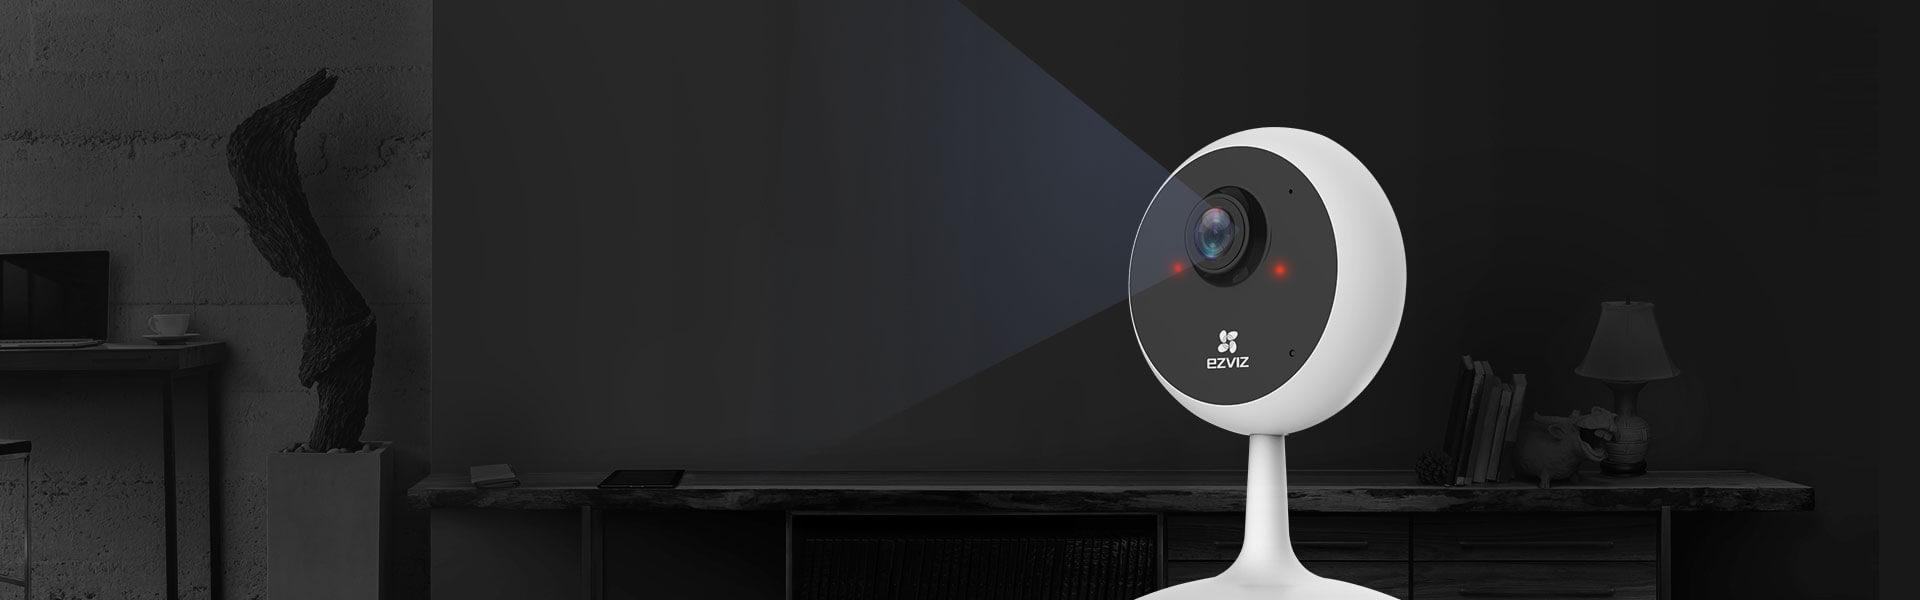 Segurança: conheça a câmera Ezviz C1C